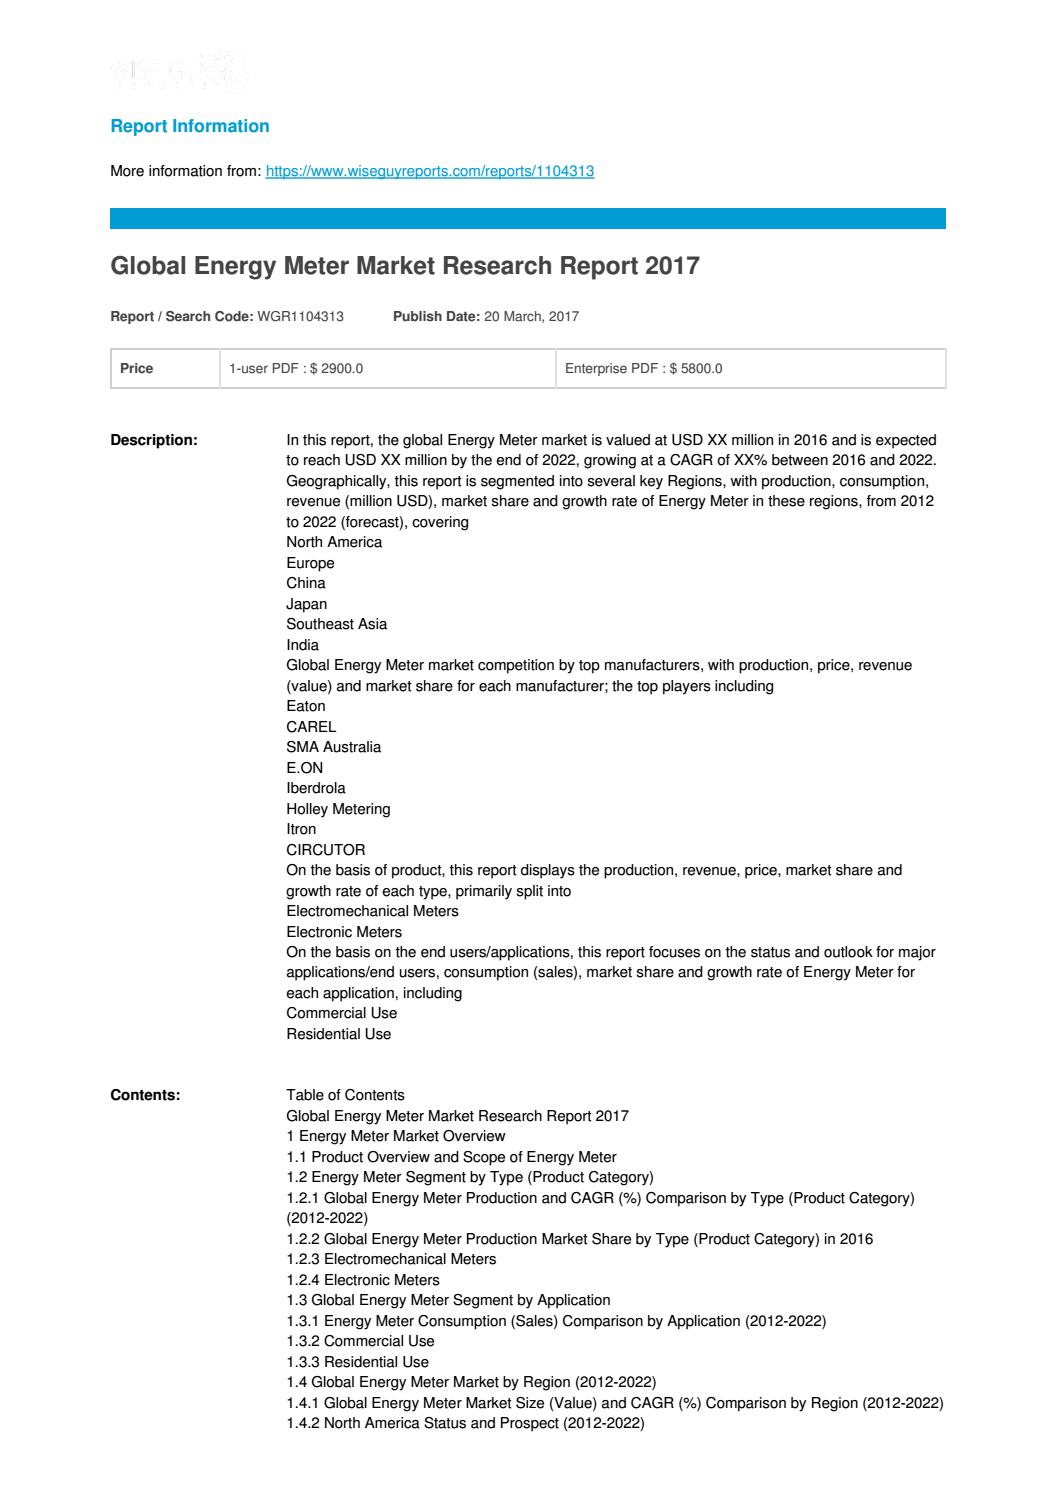 Global energy meter market research report 2017 by Naseer